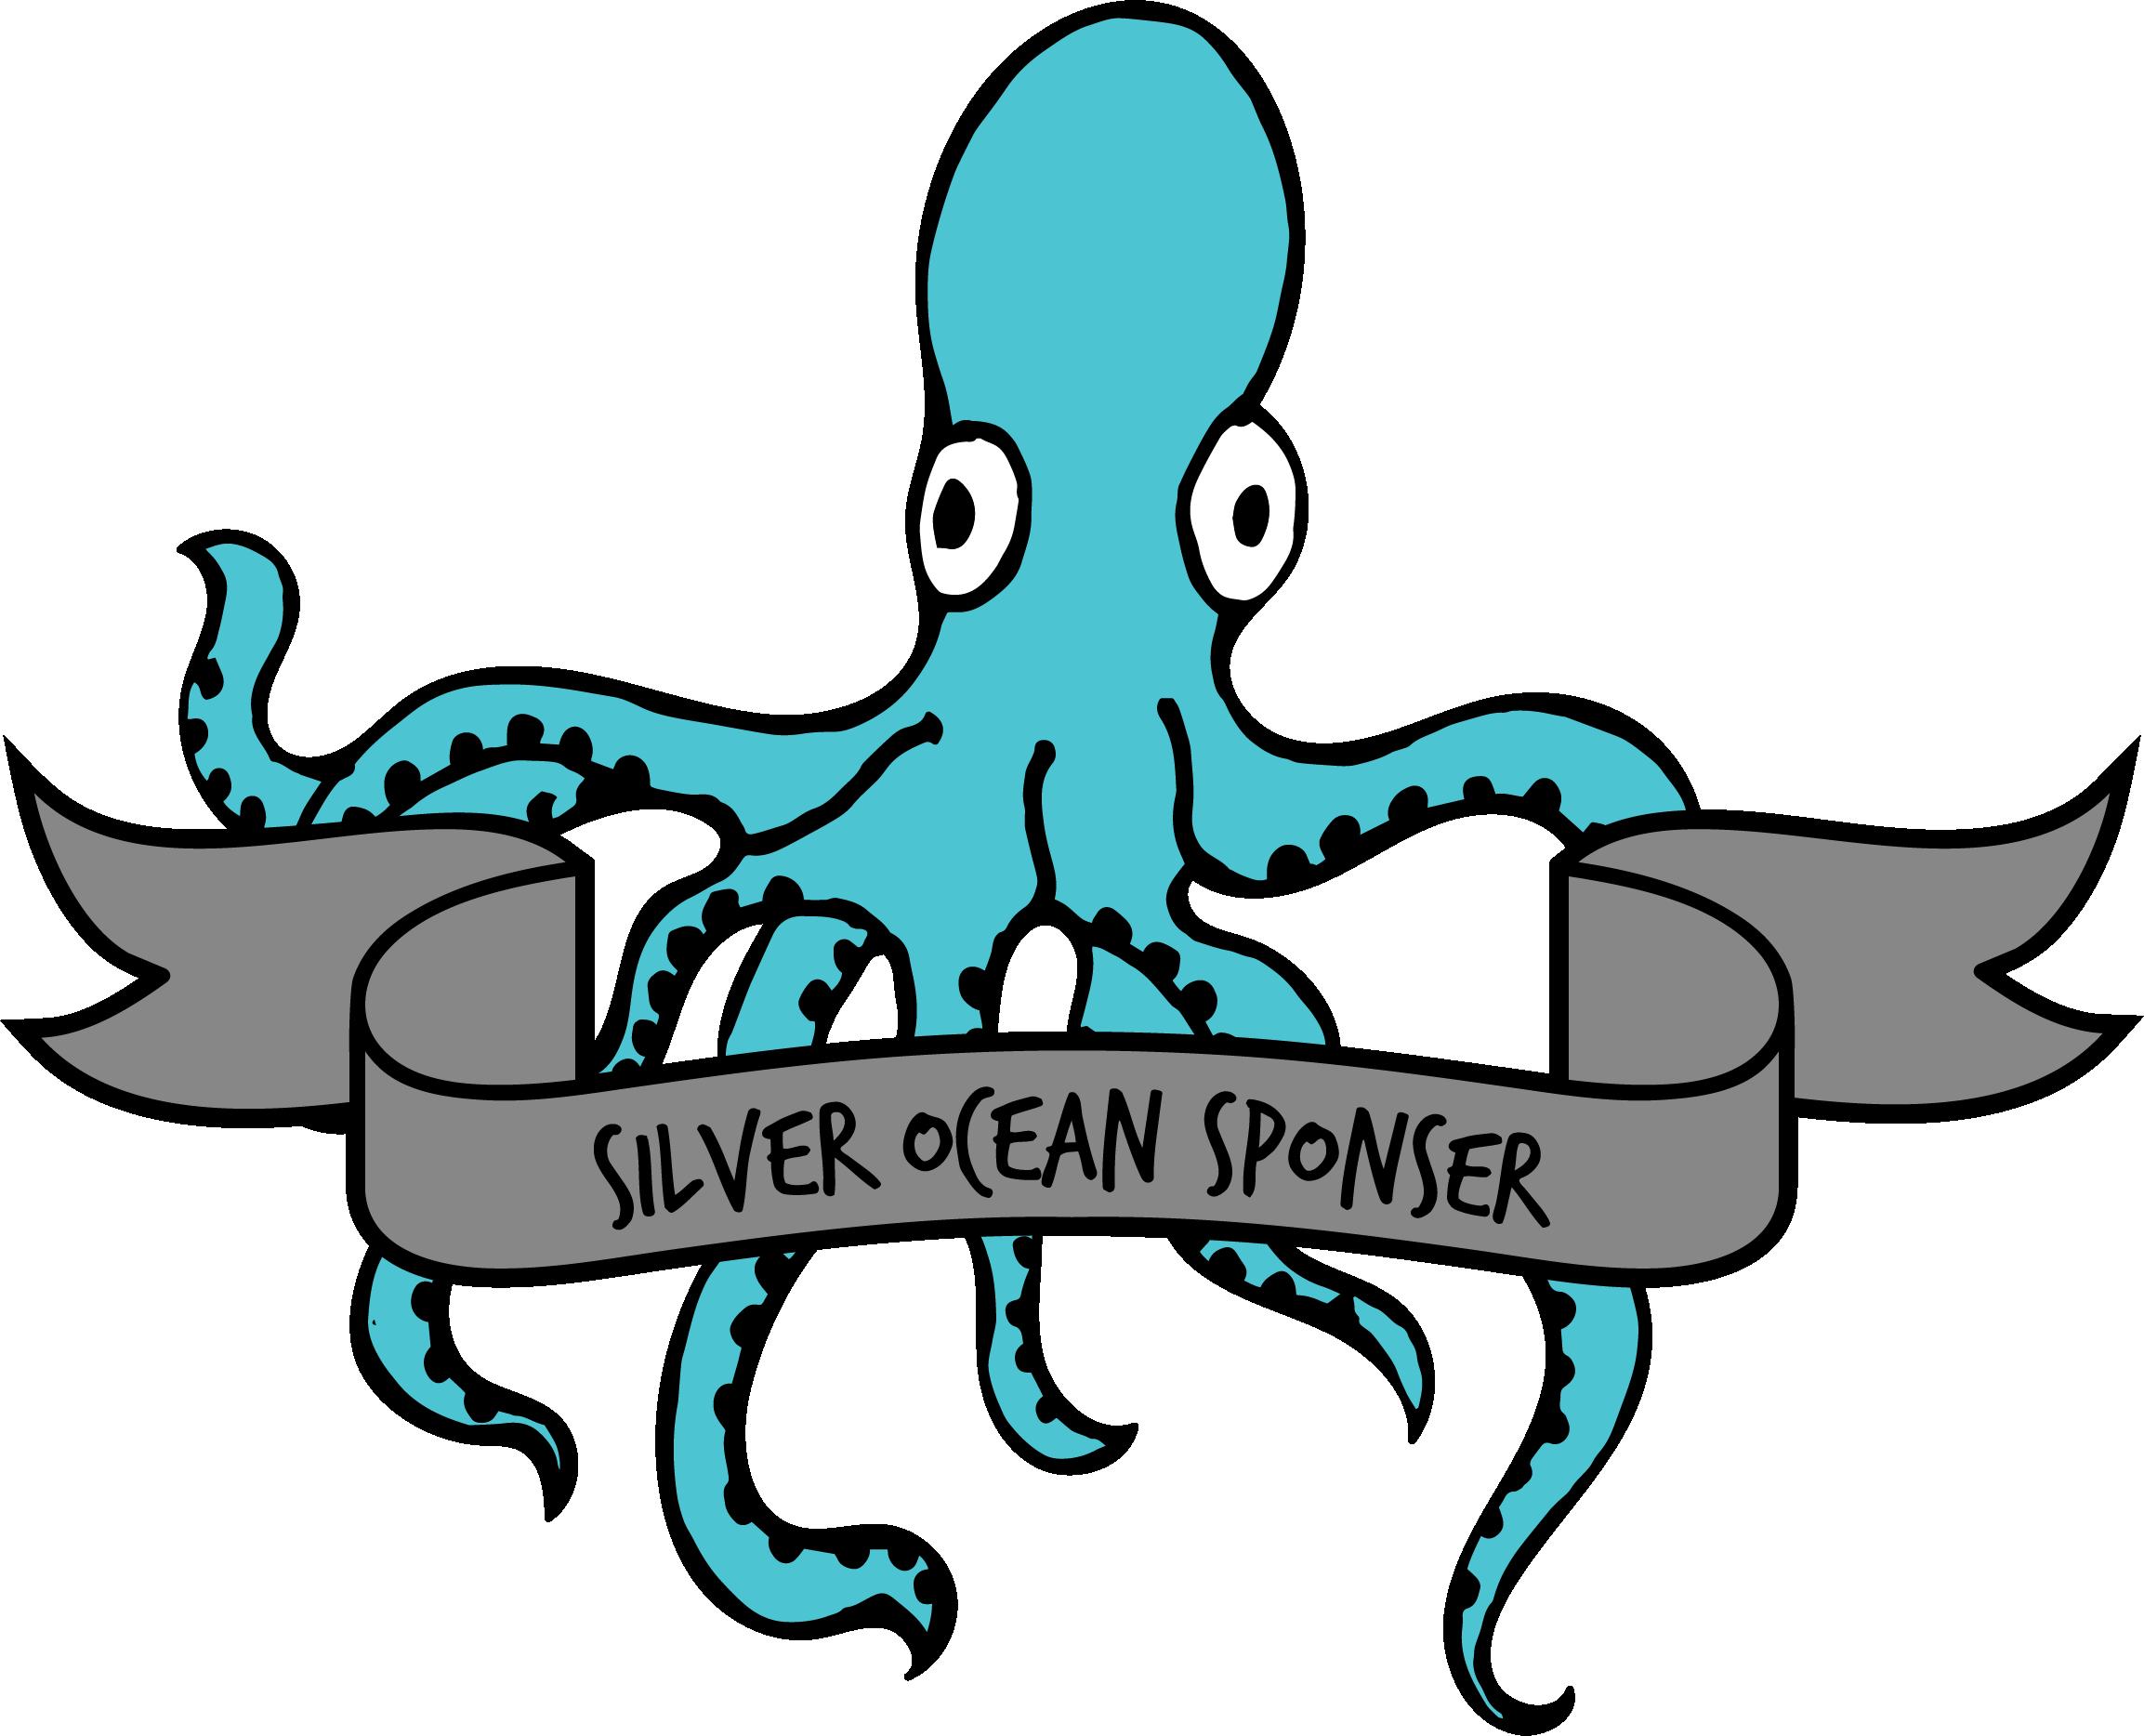 Octopus Silver Sponsor